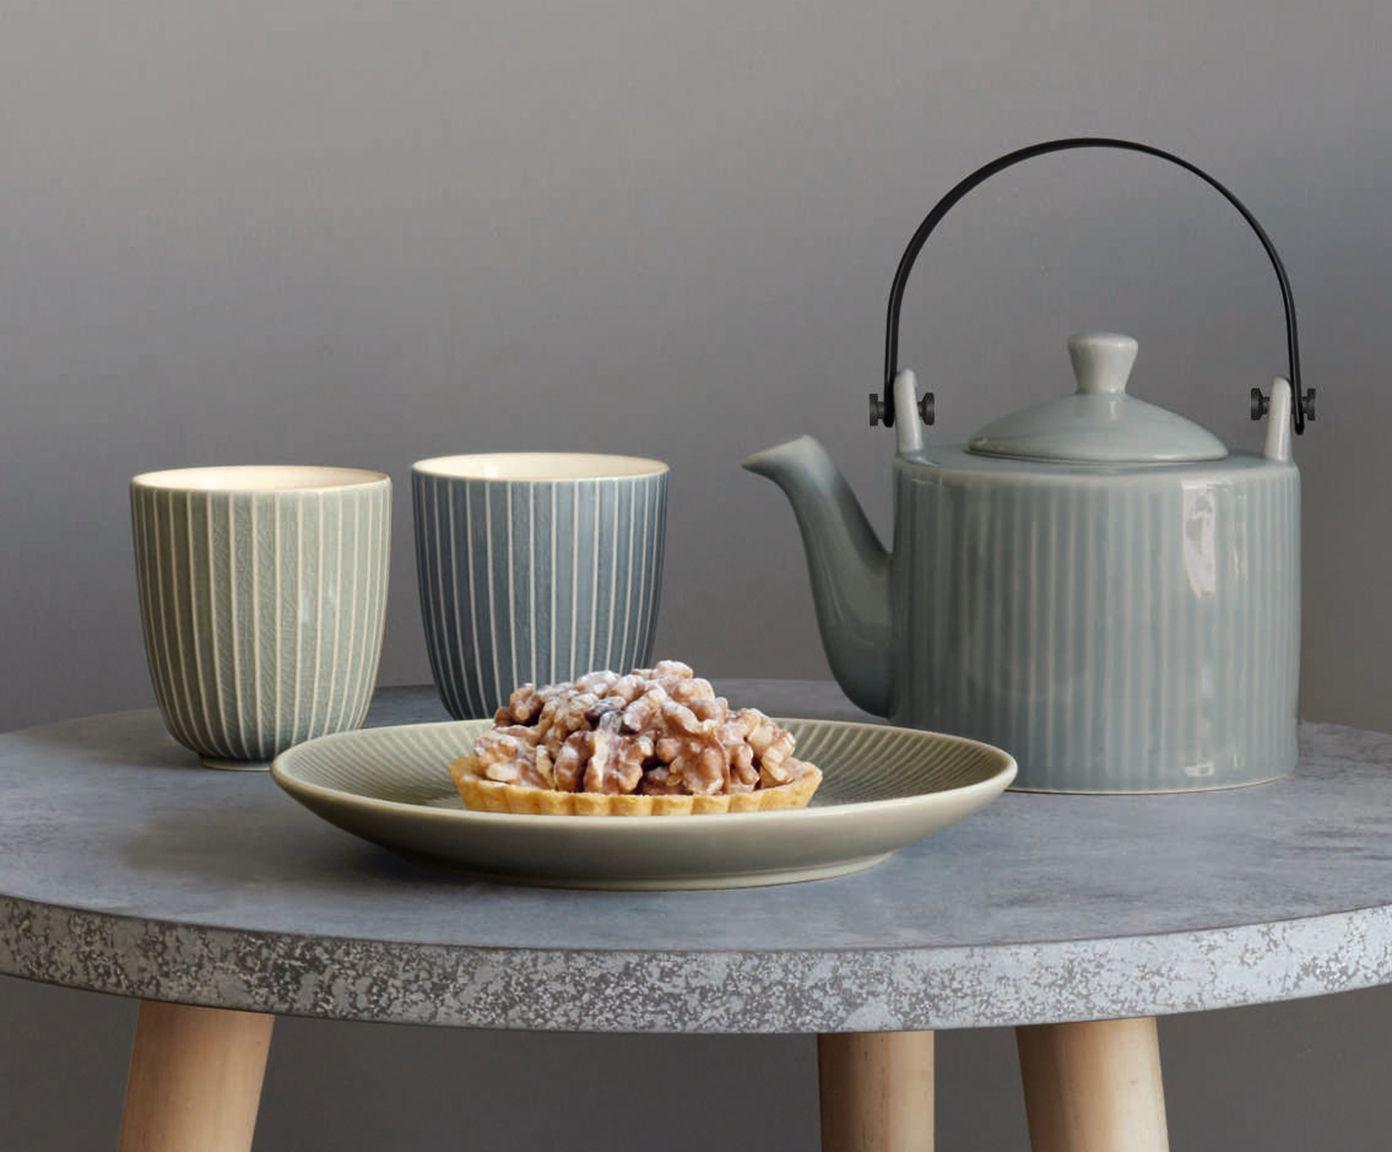 AFFILIATELINK | Becher Set Linea, 4 Tlg., Skandinavisch, Design,